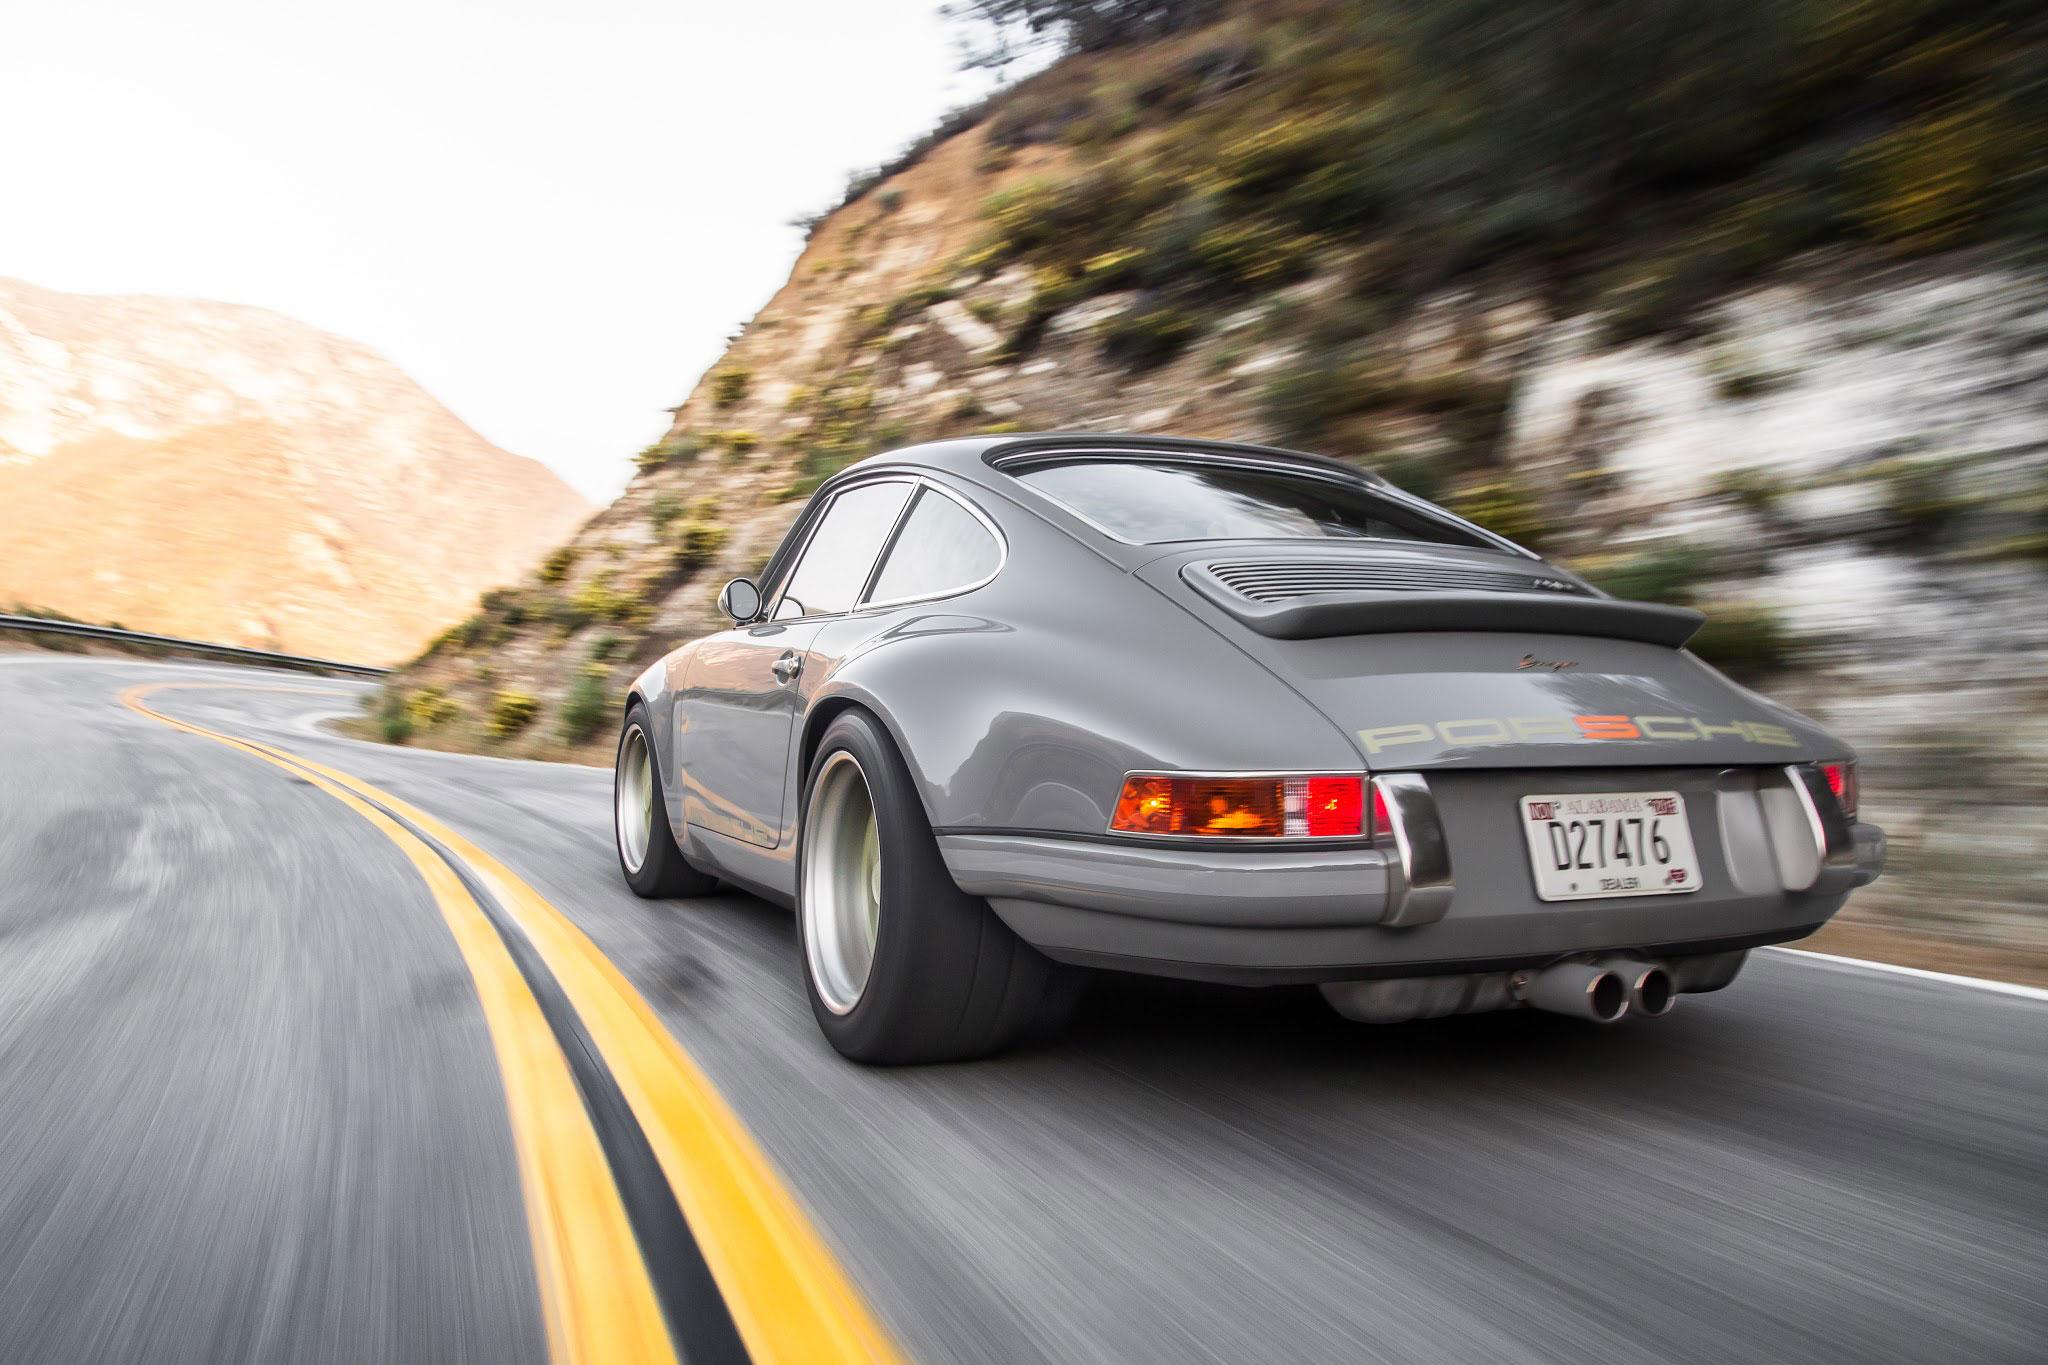 driving the 1990 porsche 911 reimagined by singer vehicle. Black Bedroom Furniture Sets. Home Design Ideas